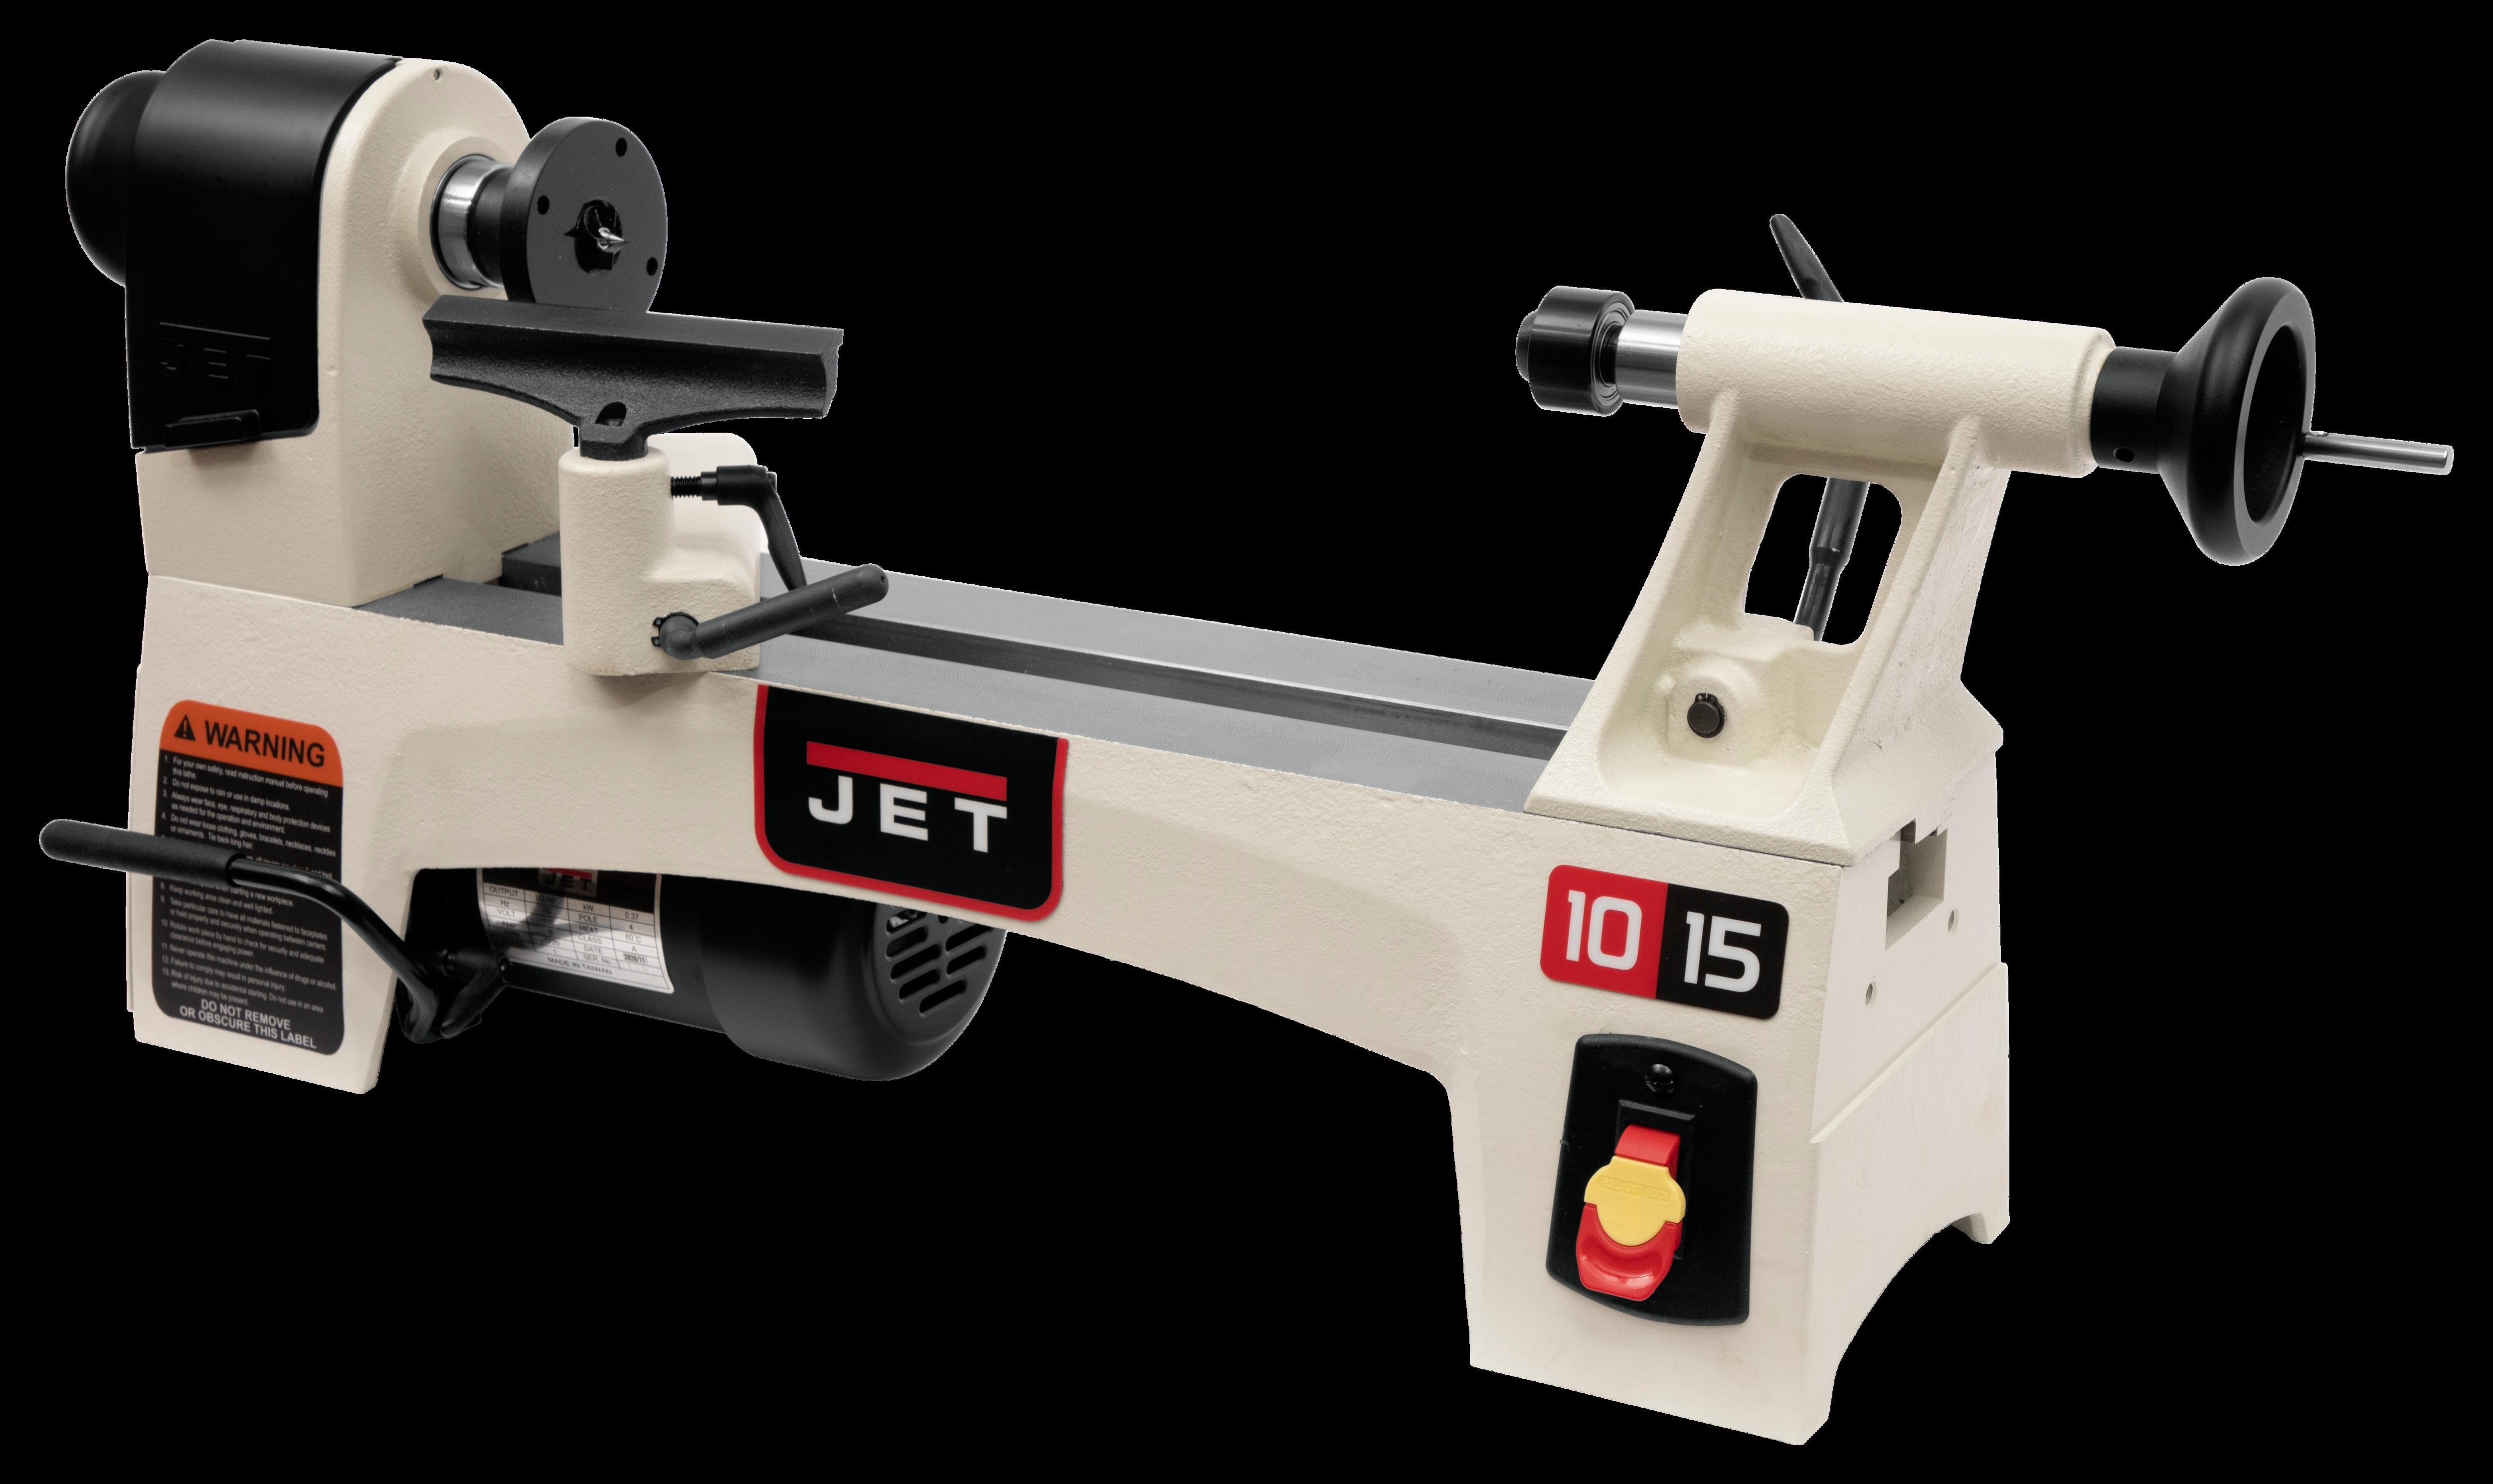 JWL-1015 10'' x 15'' Wood Lathe